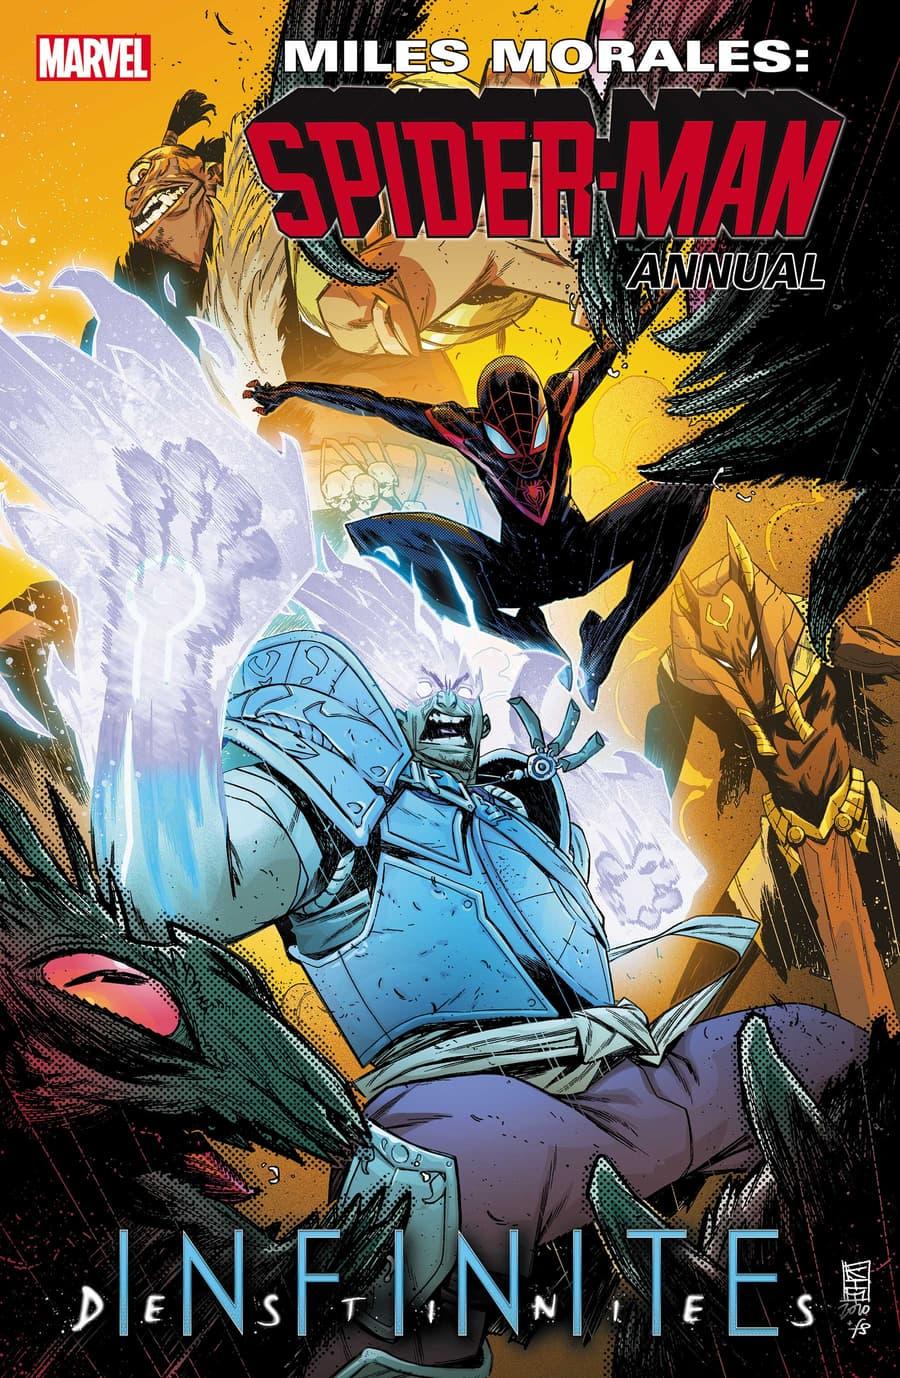 MILES MORALES: SPIDER-MAN ANNUAL #1 cover by Kim Jacinto and Felipe Sobreiro